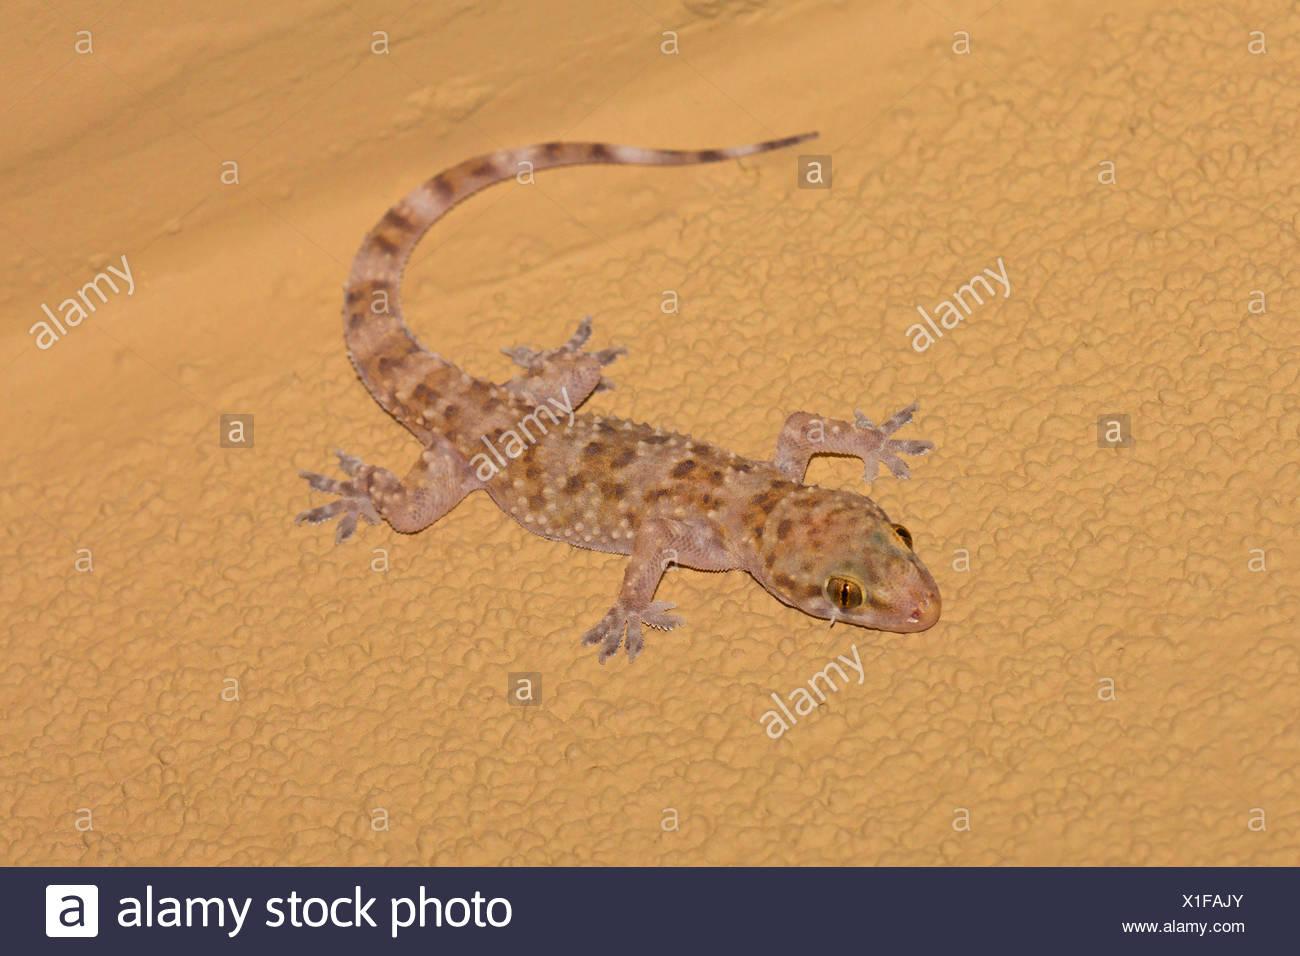 Bagno turco gecko, Mediterraneo gecko (Hemidactylus turcicus), si siede a un mantello, USA, Arizona Immagini Stock